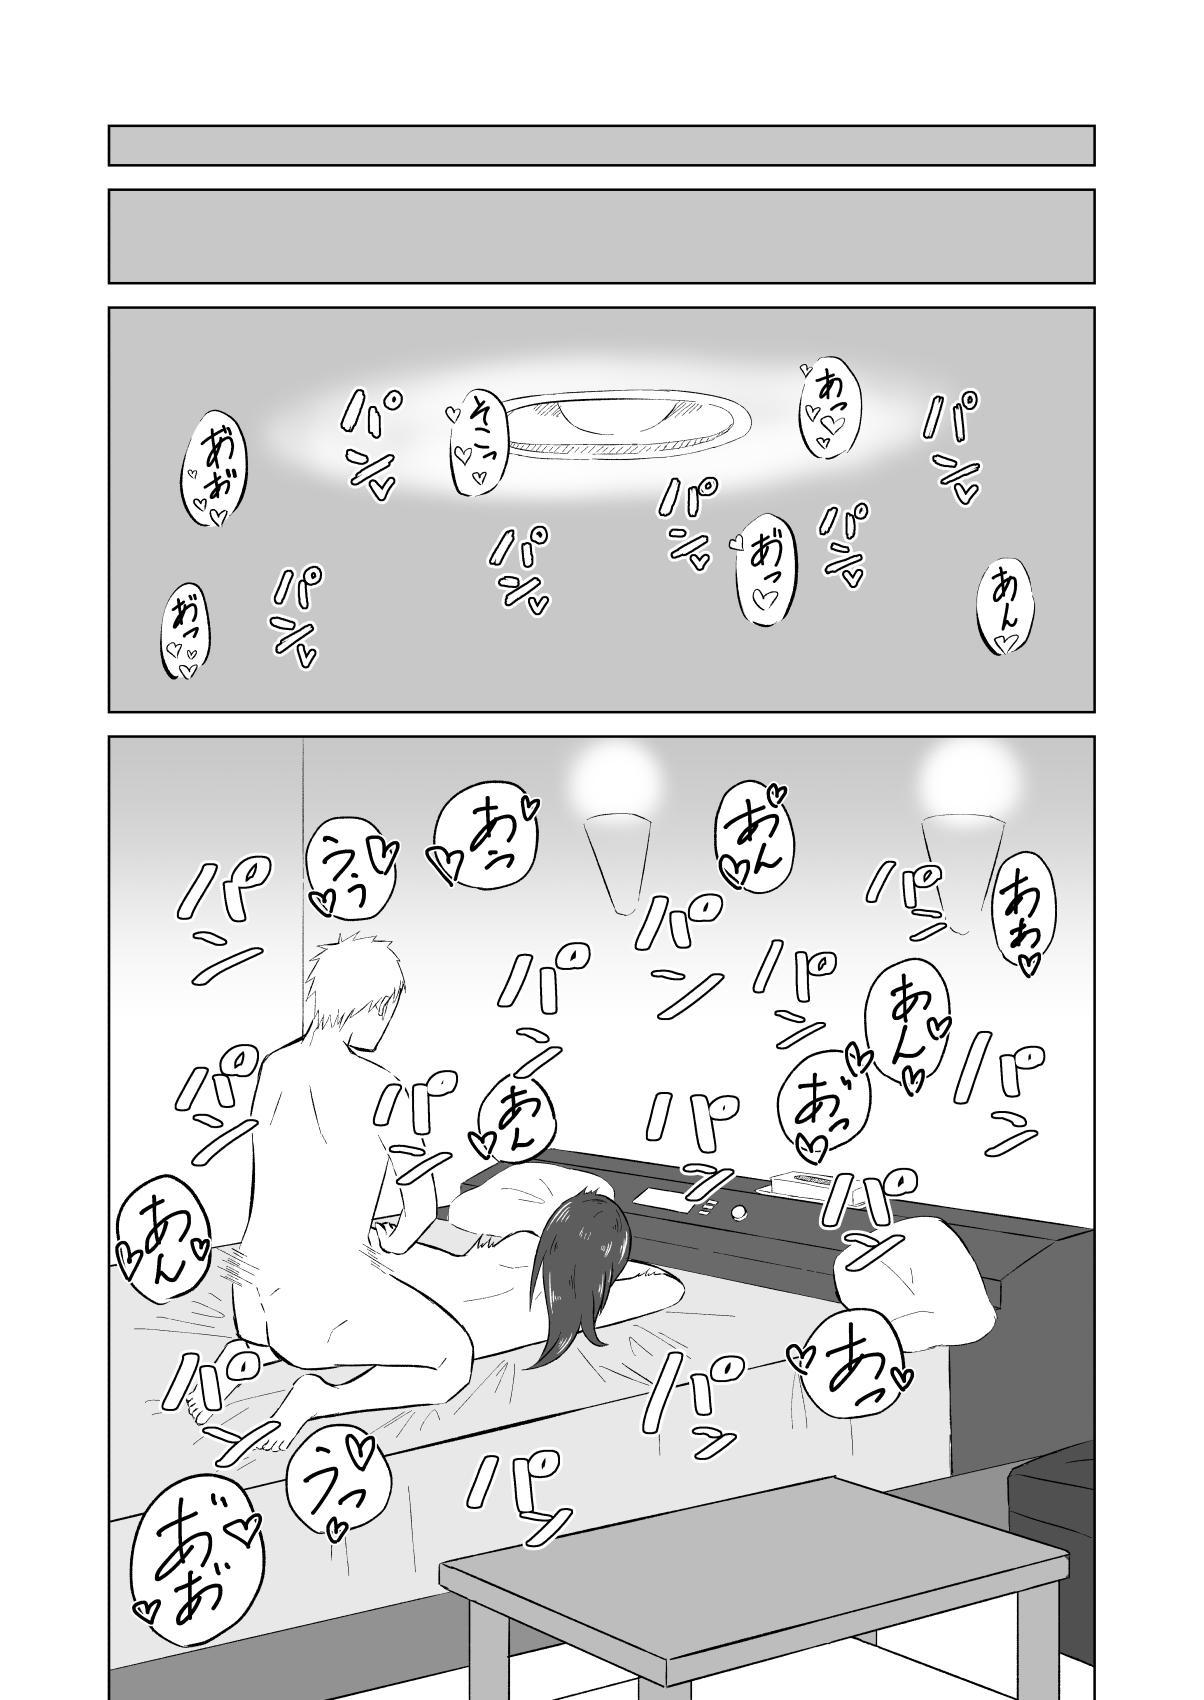 Hitozuma ga Off-kai de Omochikaerare Hon 15